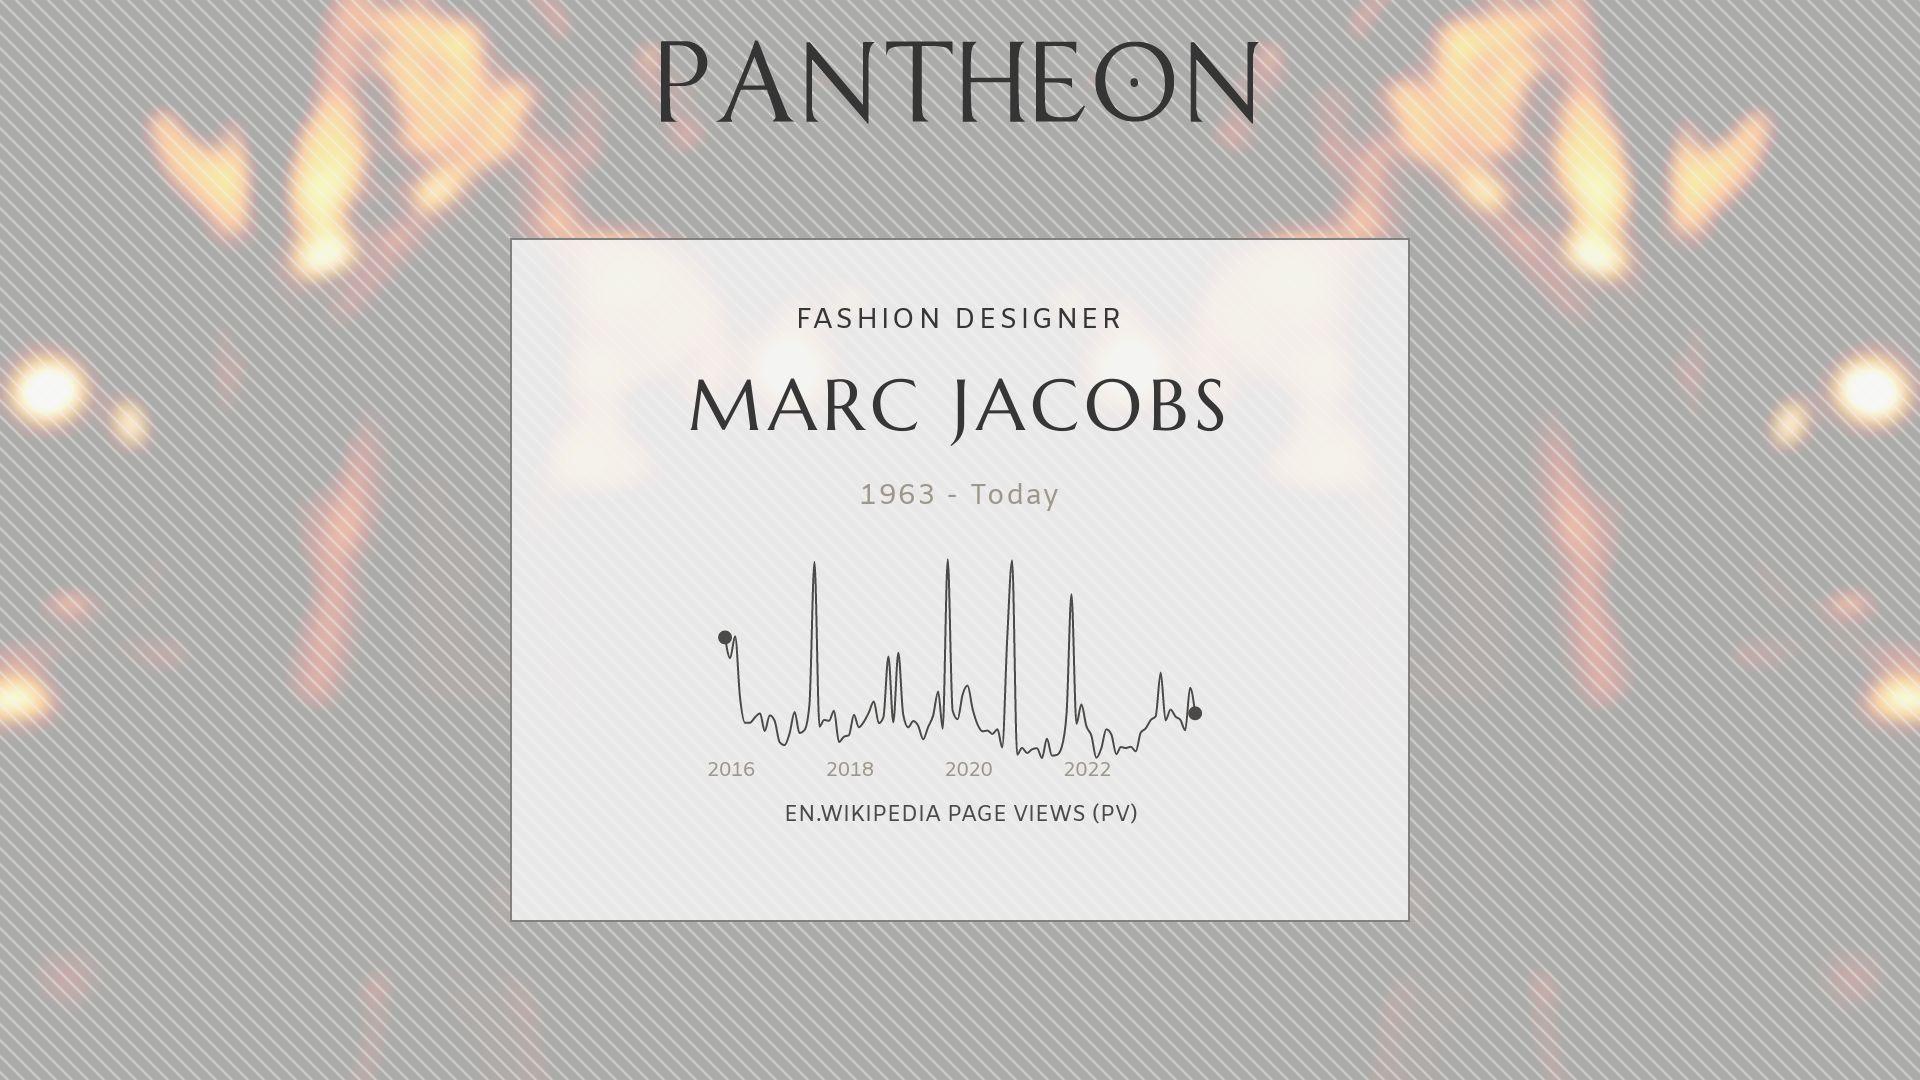 Marc Jacobs Biography Pantheon